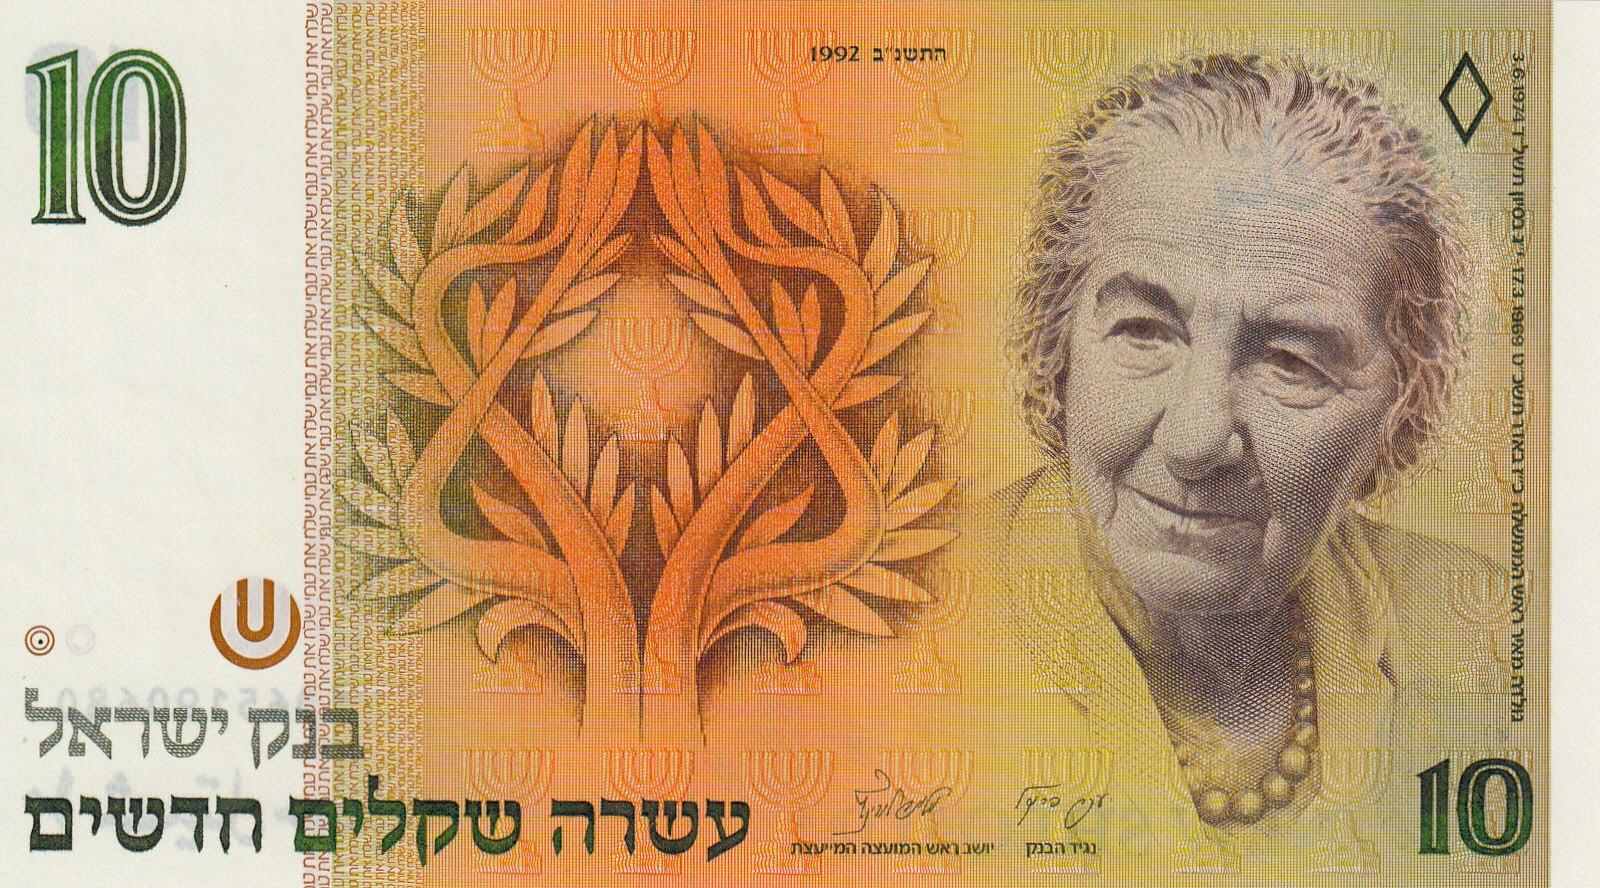 Israel 10 New Shekels Banknote 1992 Golda Meir World Banknotes Amp Coins Pictures Old Money